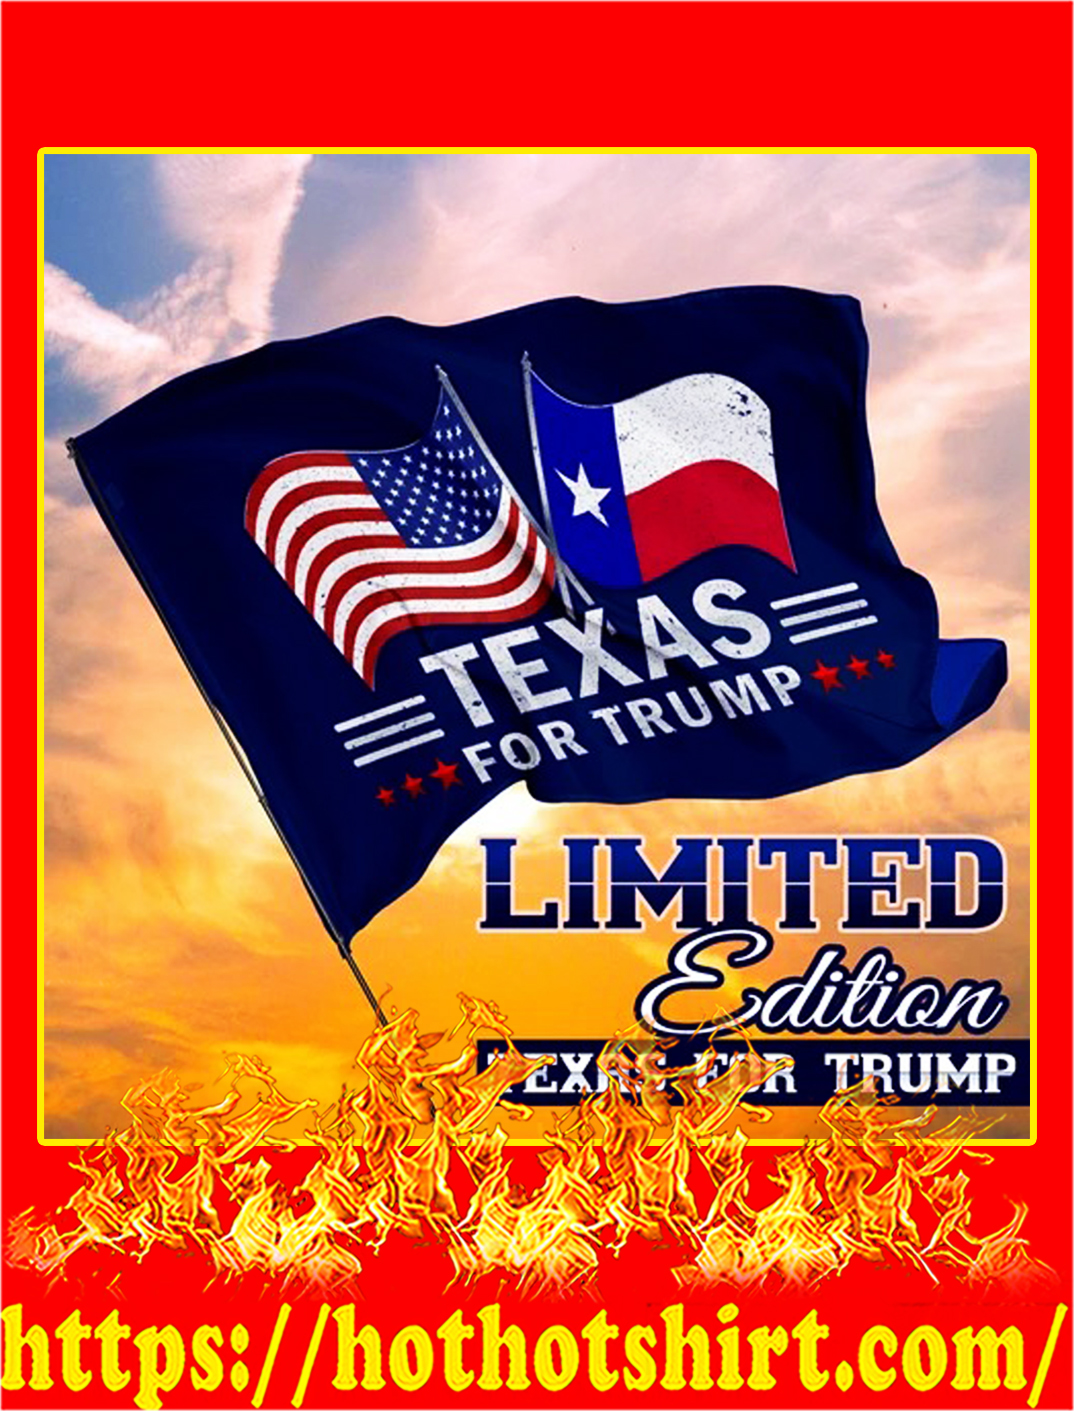 Texas for trump flag - pic 1